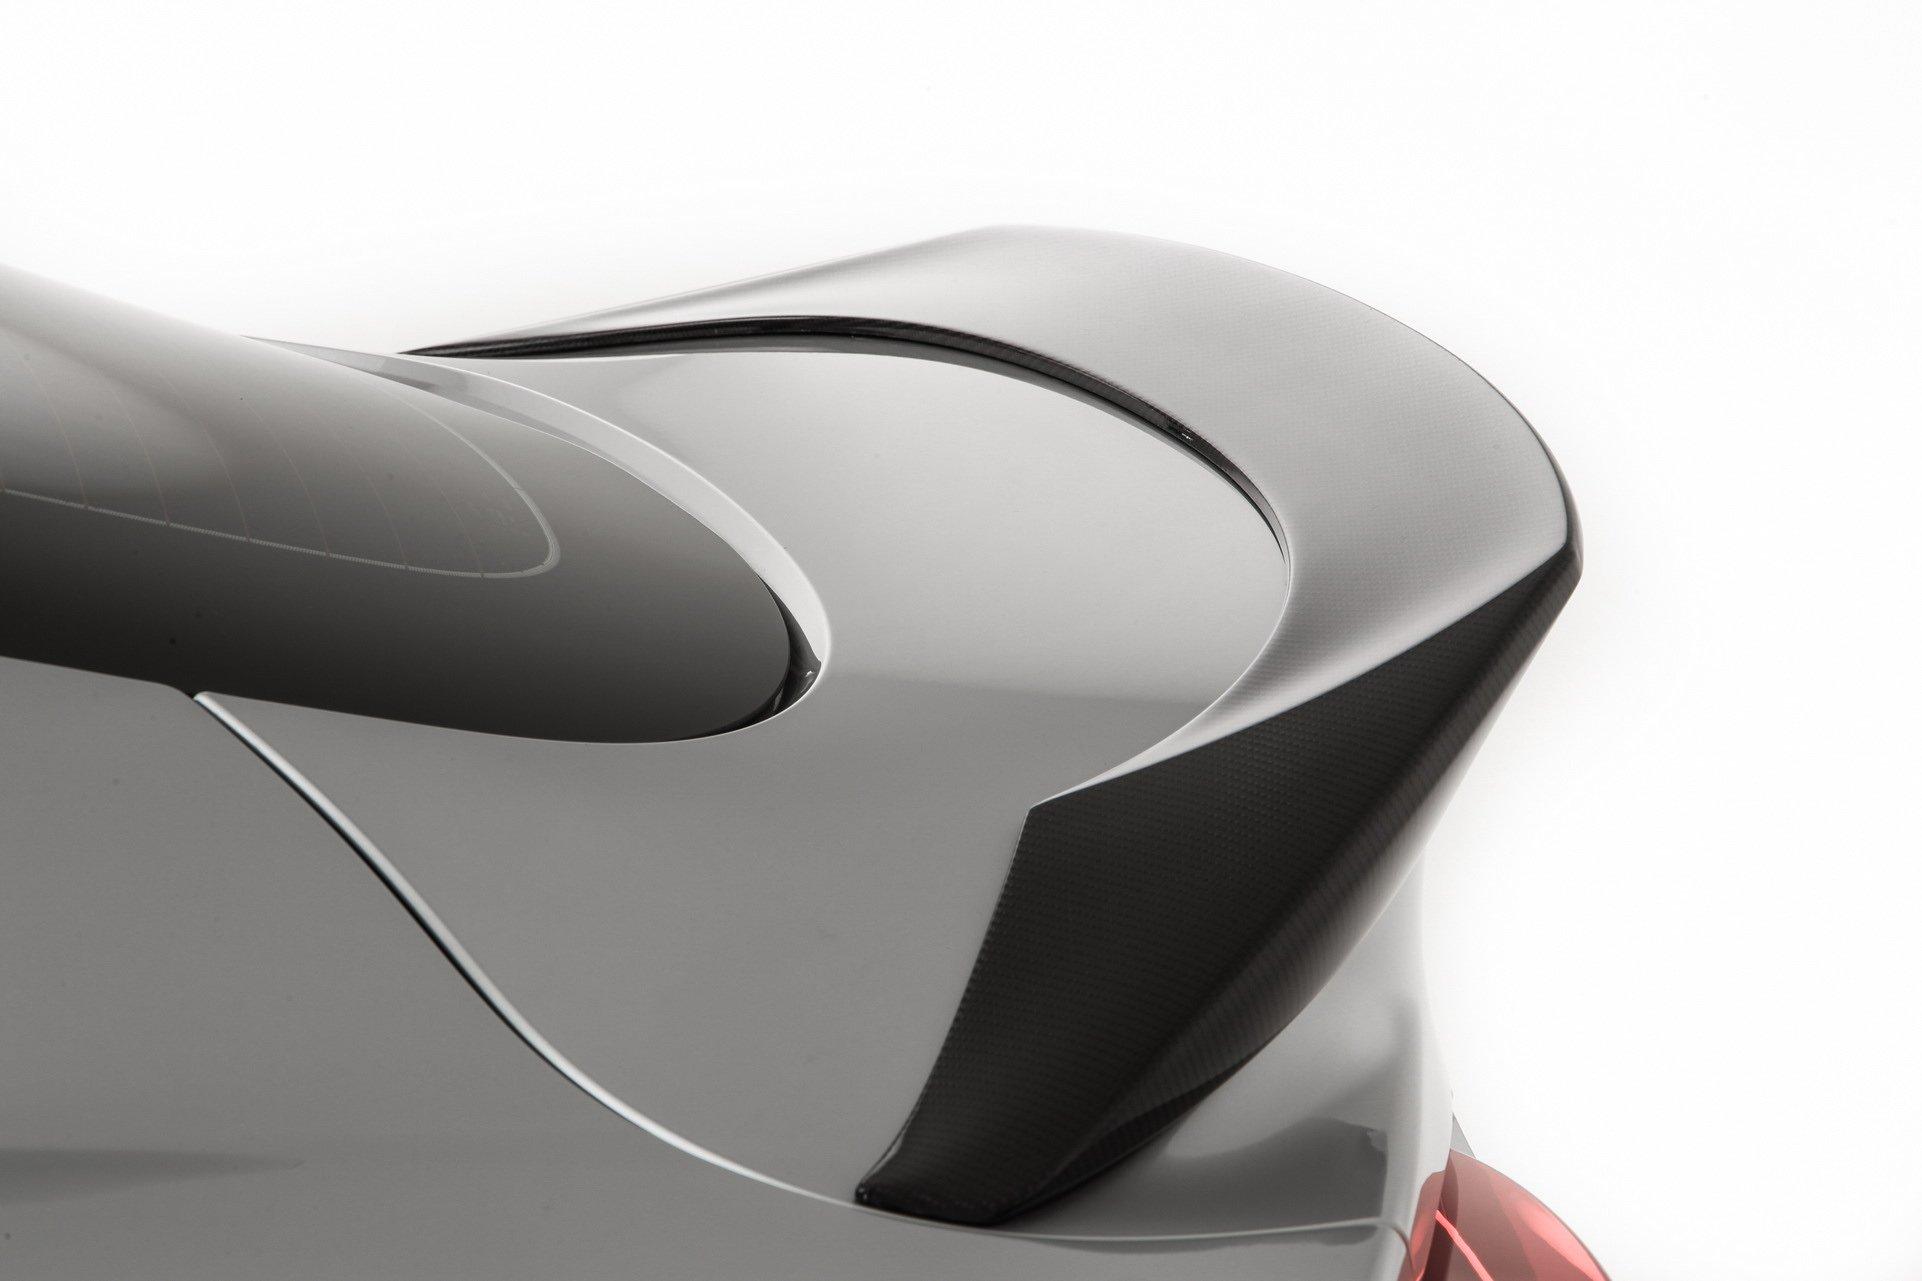 2020-Toyota-GR-Supra-Performance-Line-Concept7